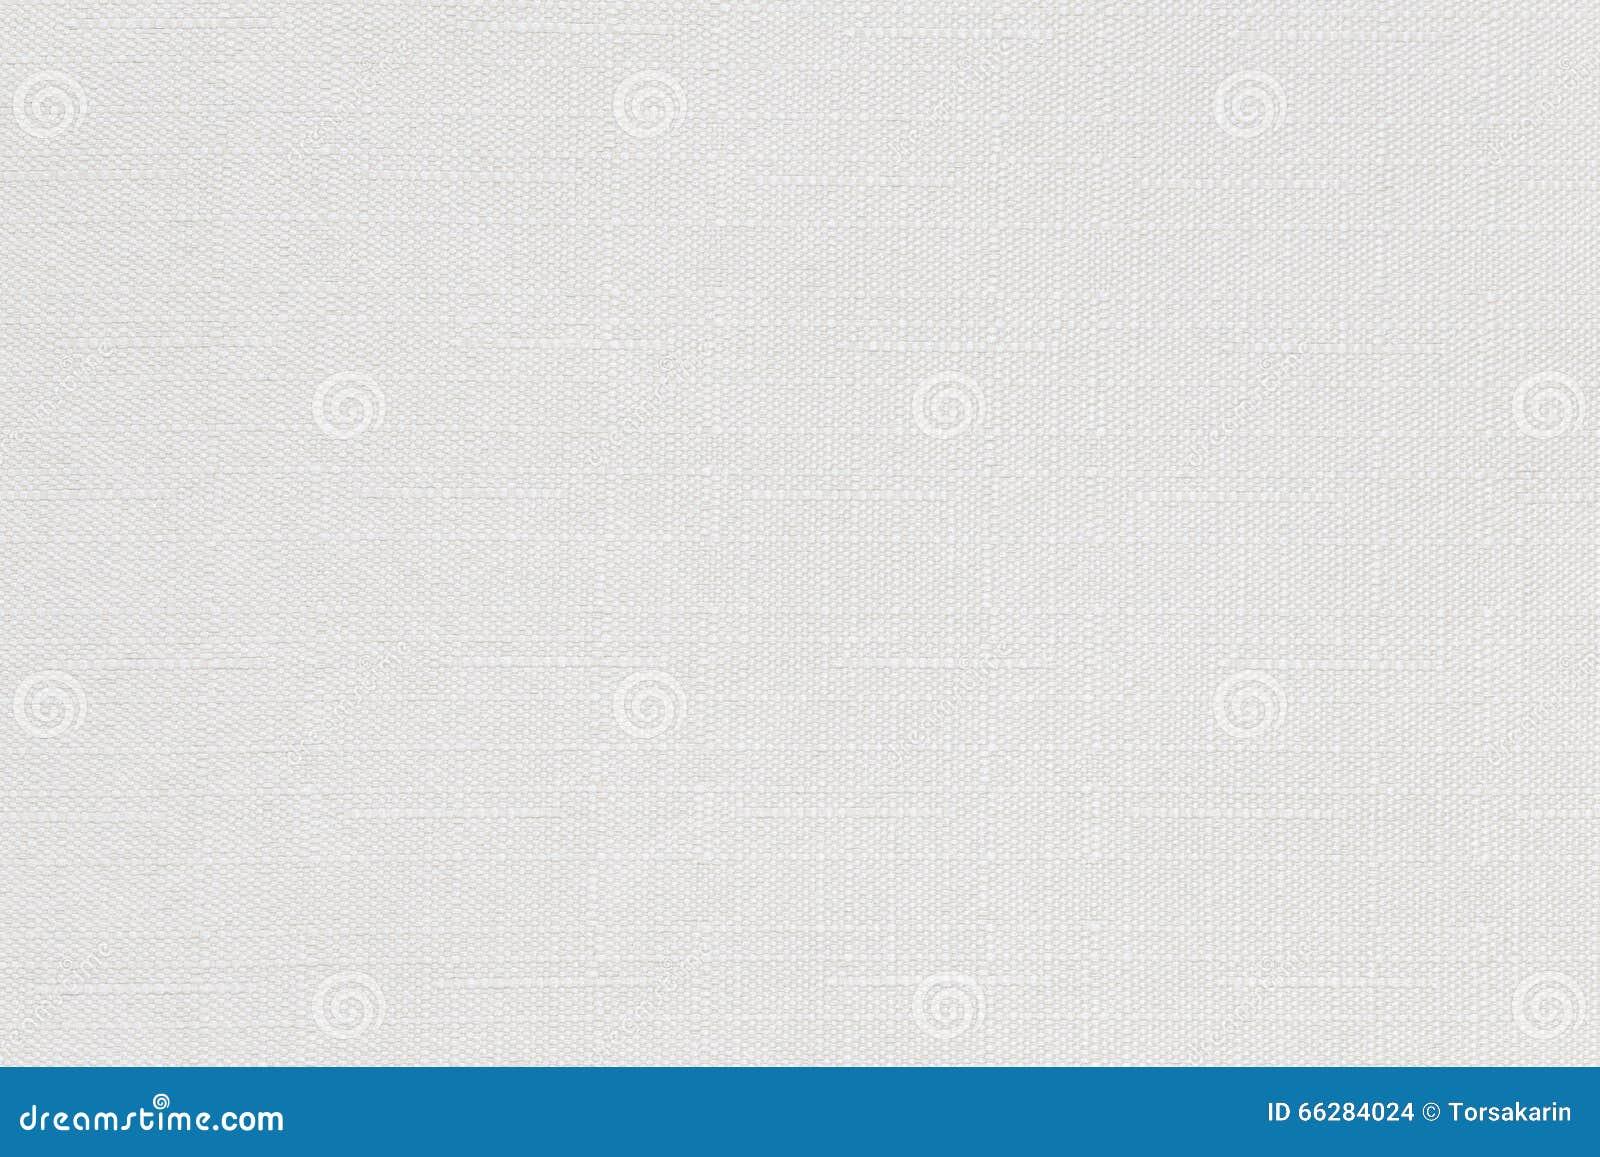 white cotton cloth background - photo #17